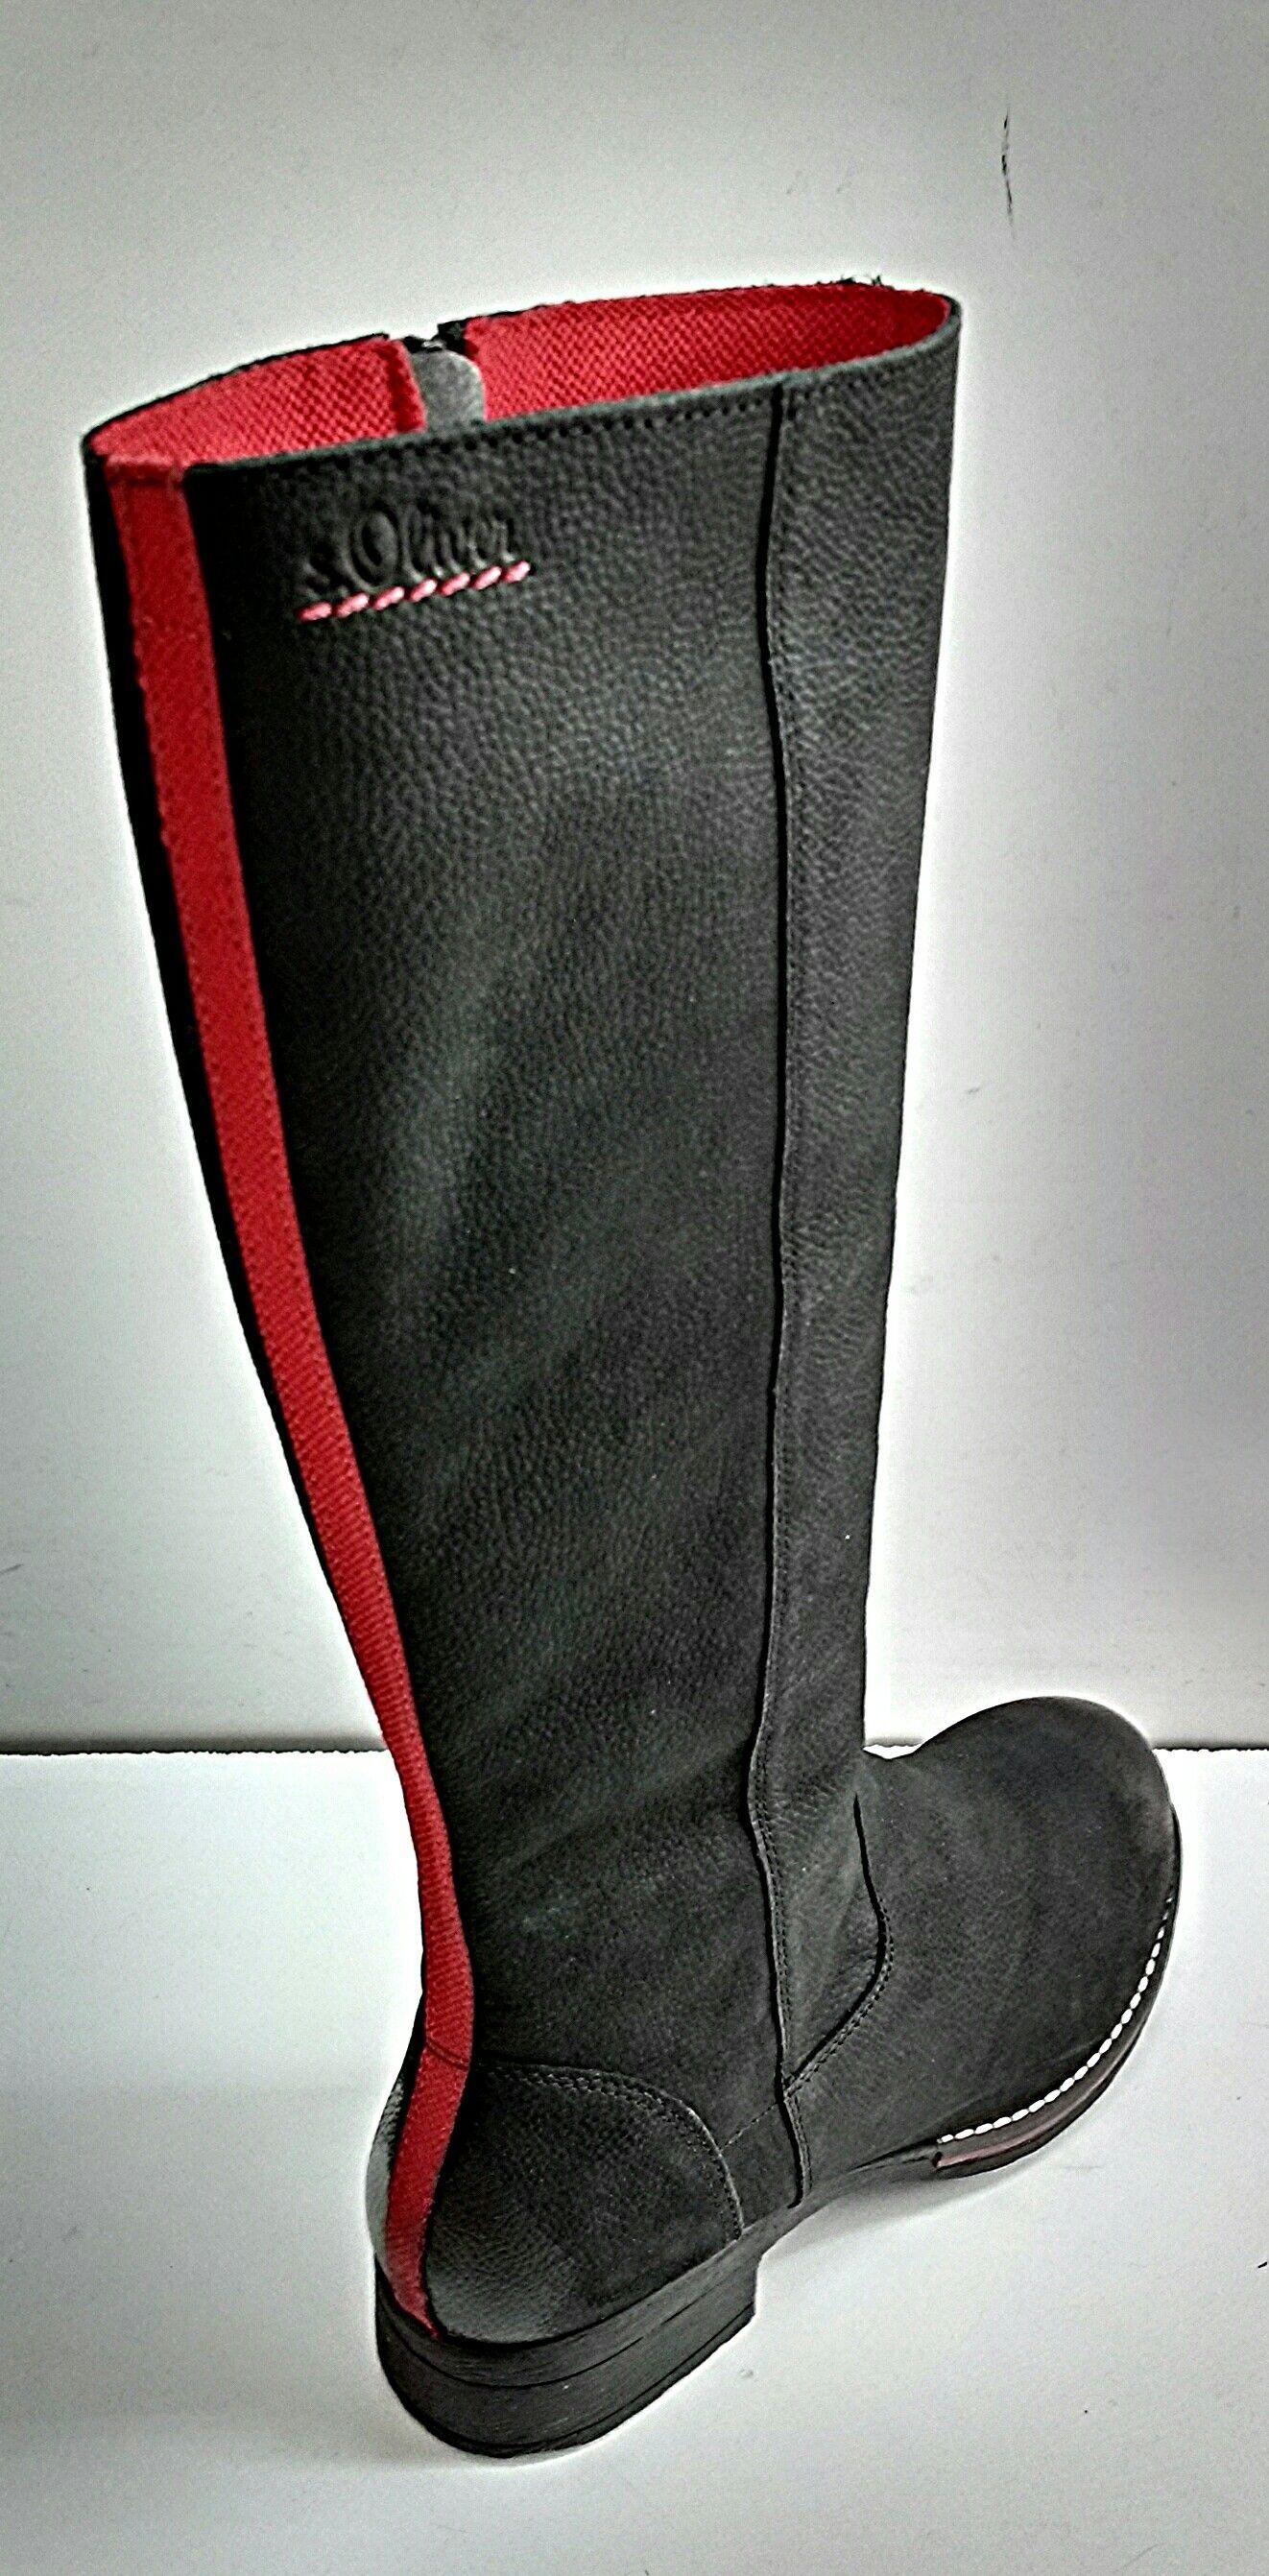 53607a41b6d Δερμάτινες γυναικείες μαύρες μπότες με κόκκινες λεπτομέρειες ...